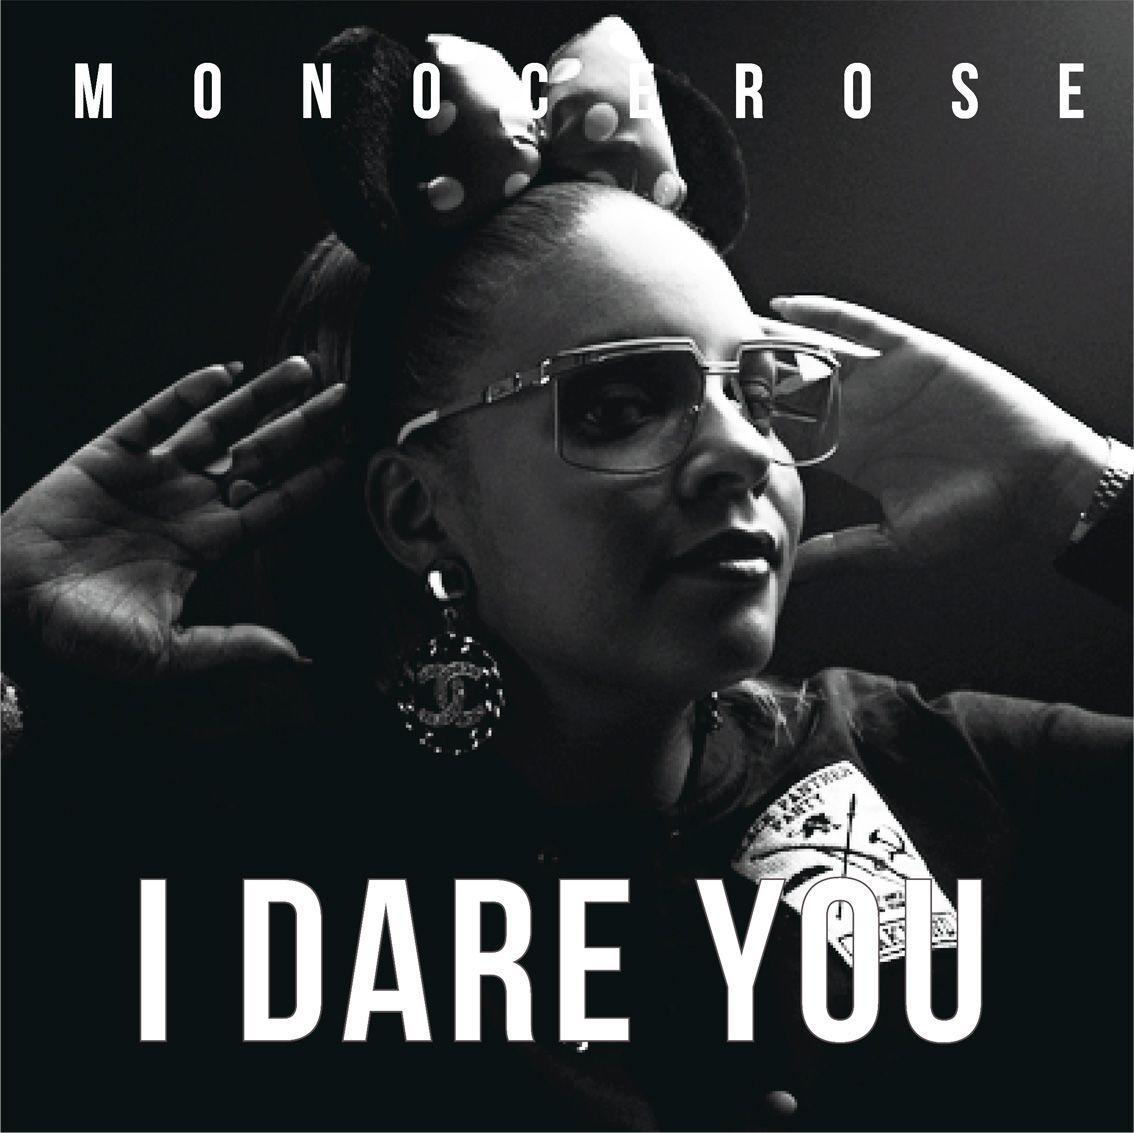 My name is Ose Cornelisse - I am a #fashion #designer - I Can't Help It - and I #dare you! #monocerose www.monocerose.com